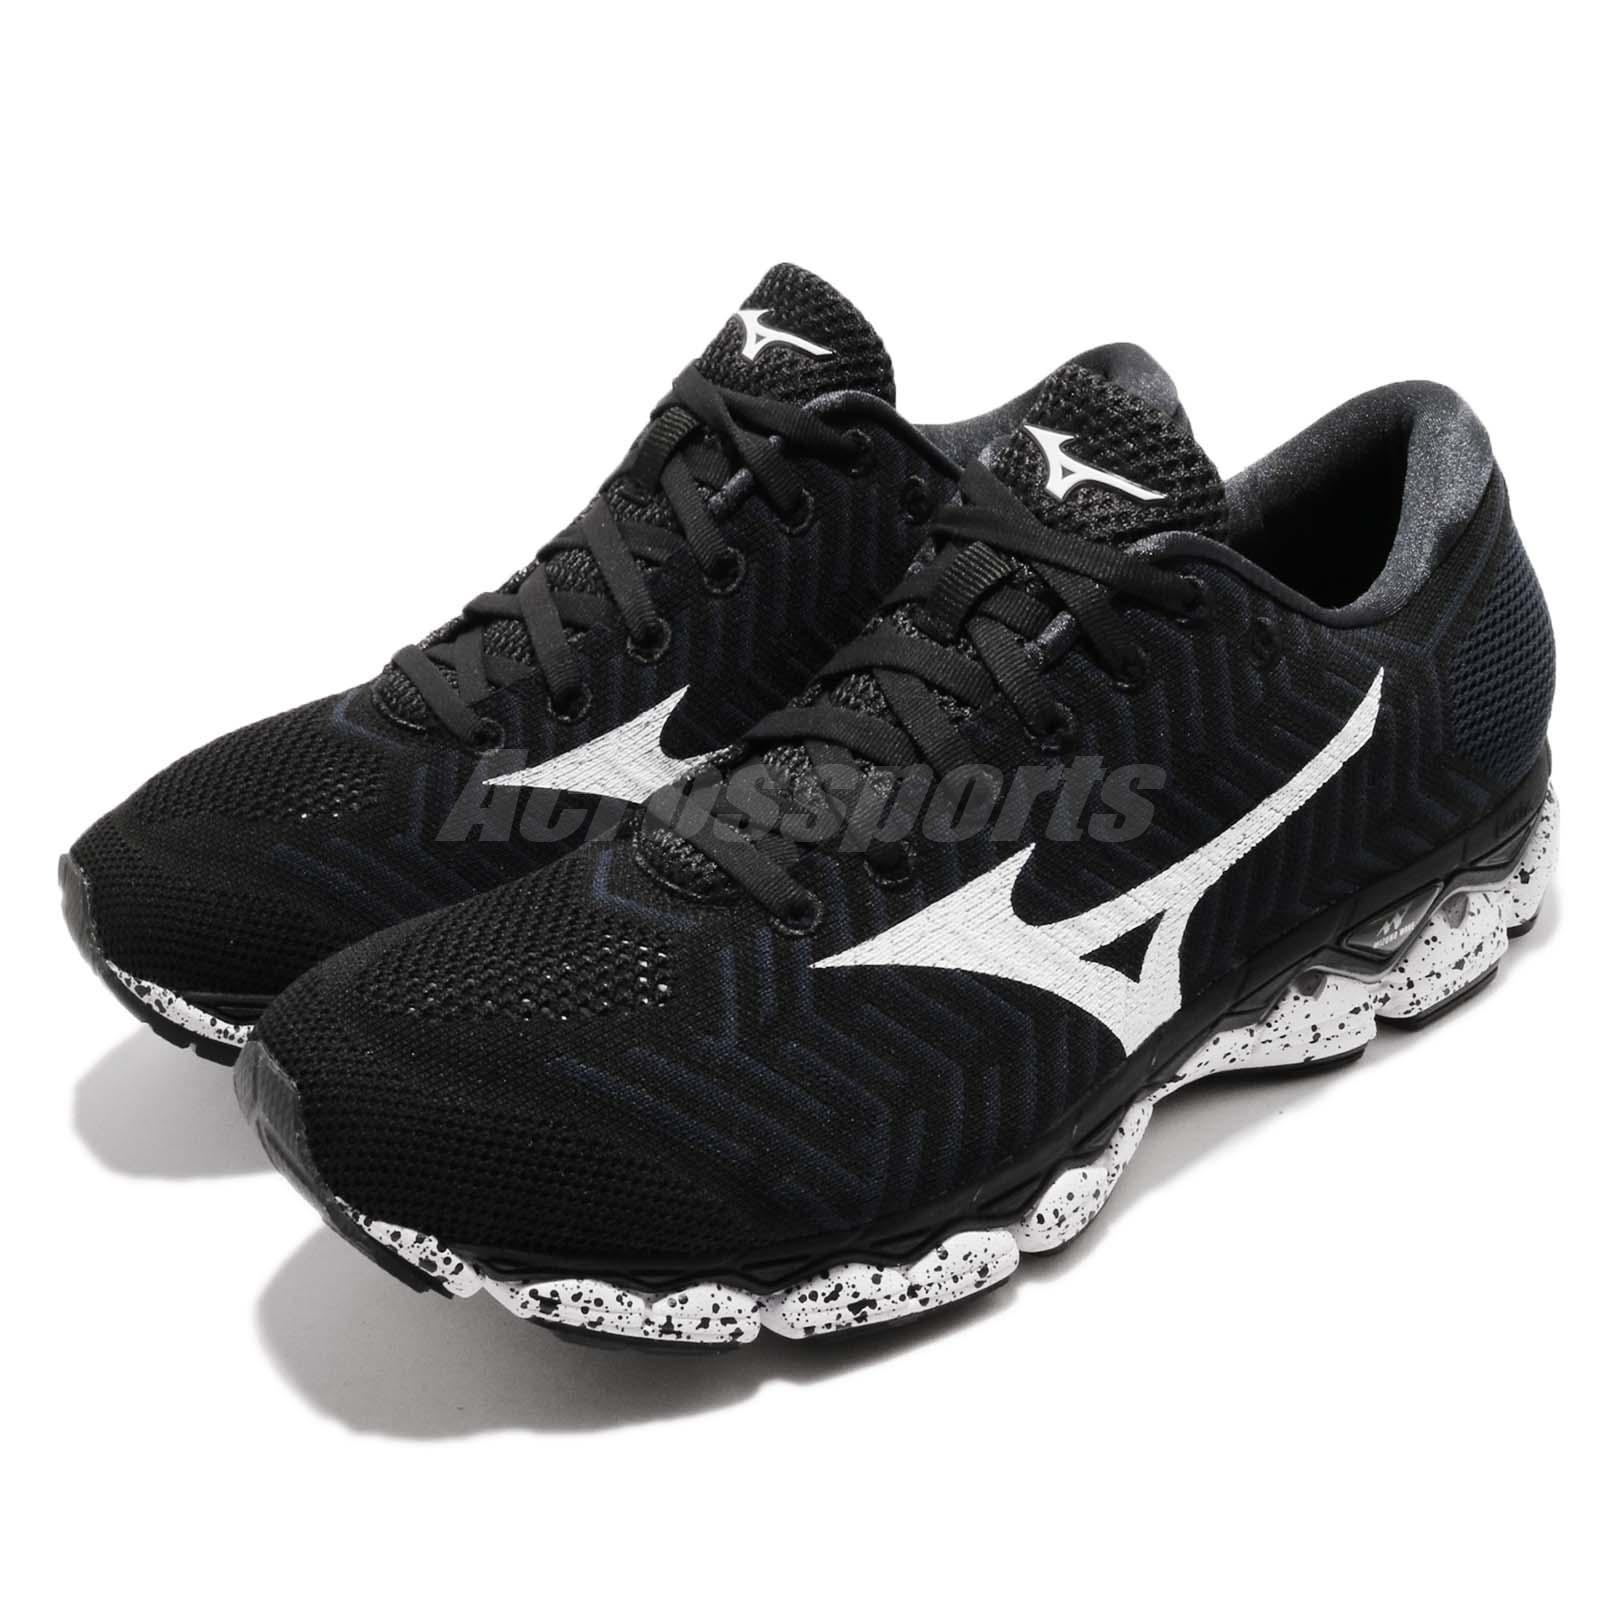 Mizuno Waveknit S1 Black White Men Running Shoes Sneakers Trainers J1GC1825-09